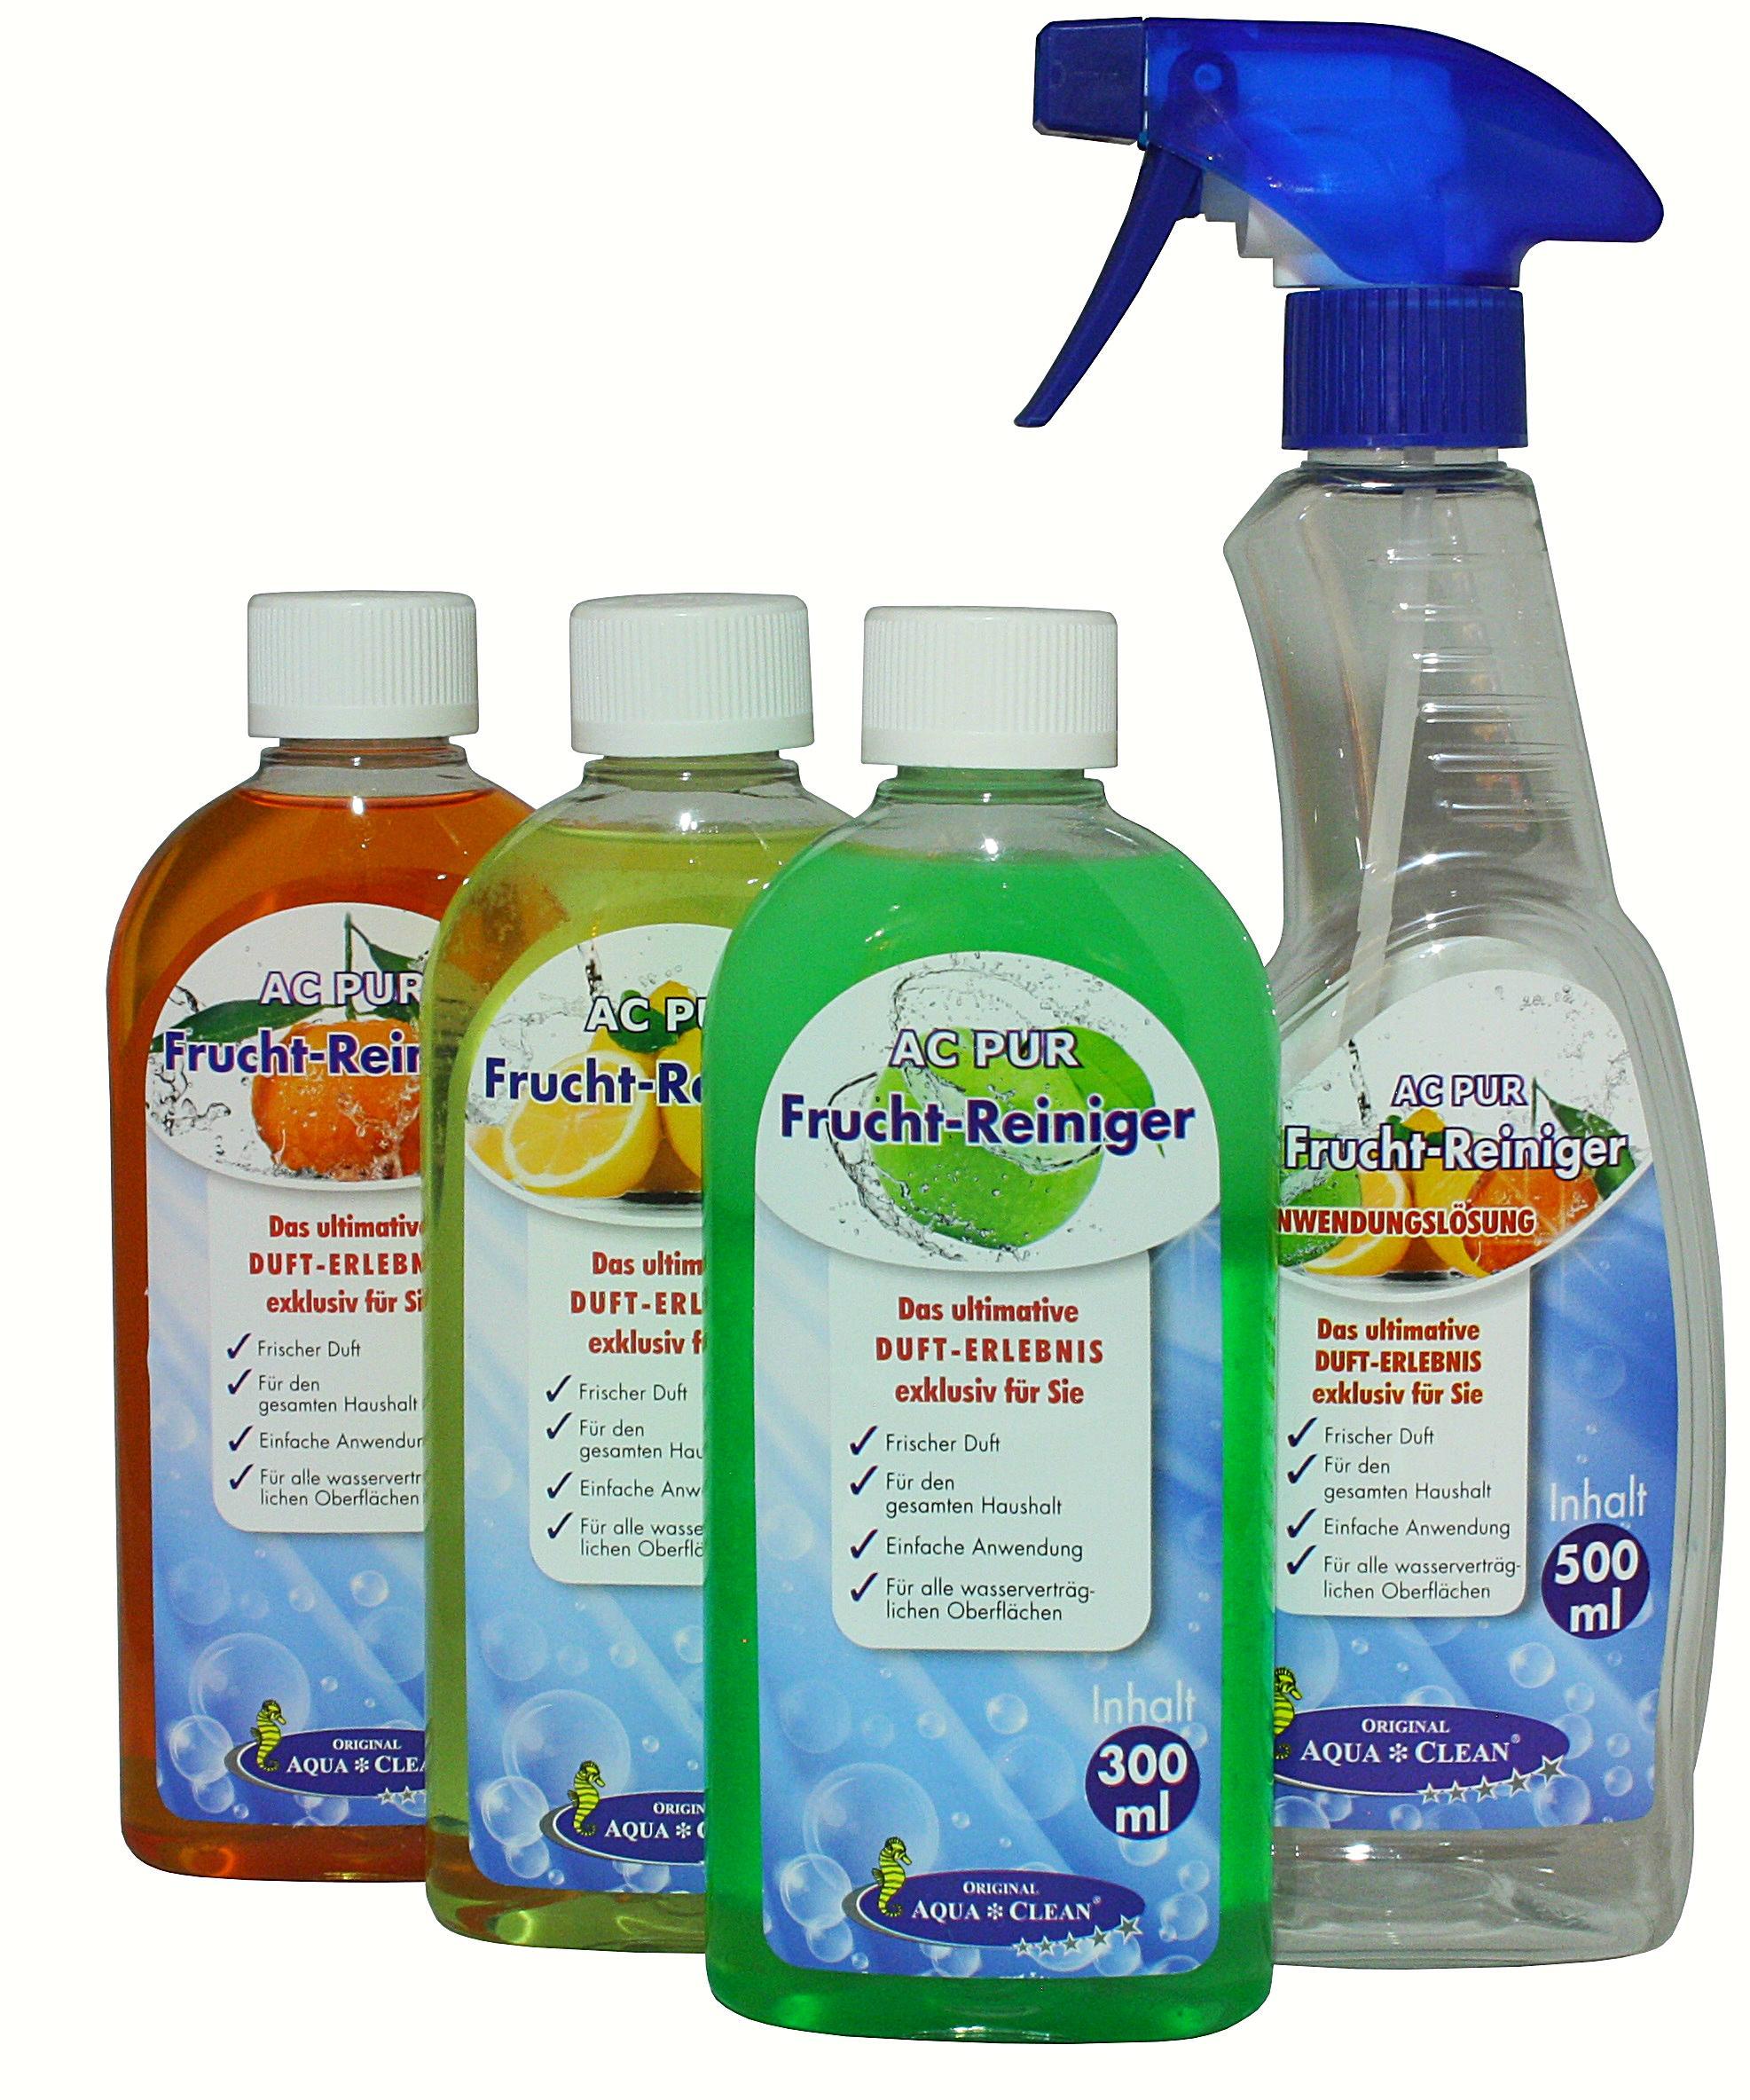 Populair AC PUR Frucht-Reiniger Konzentrat effizienter Fettlöser 3x 300ml VN62